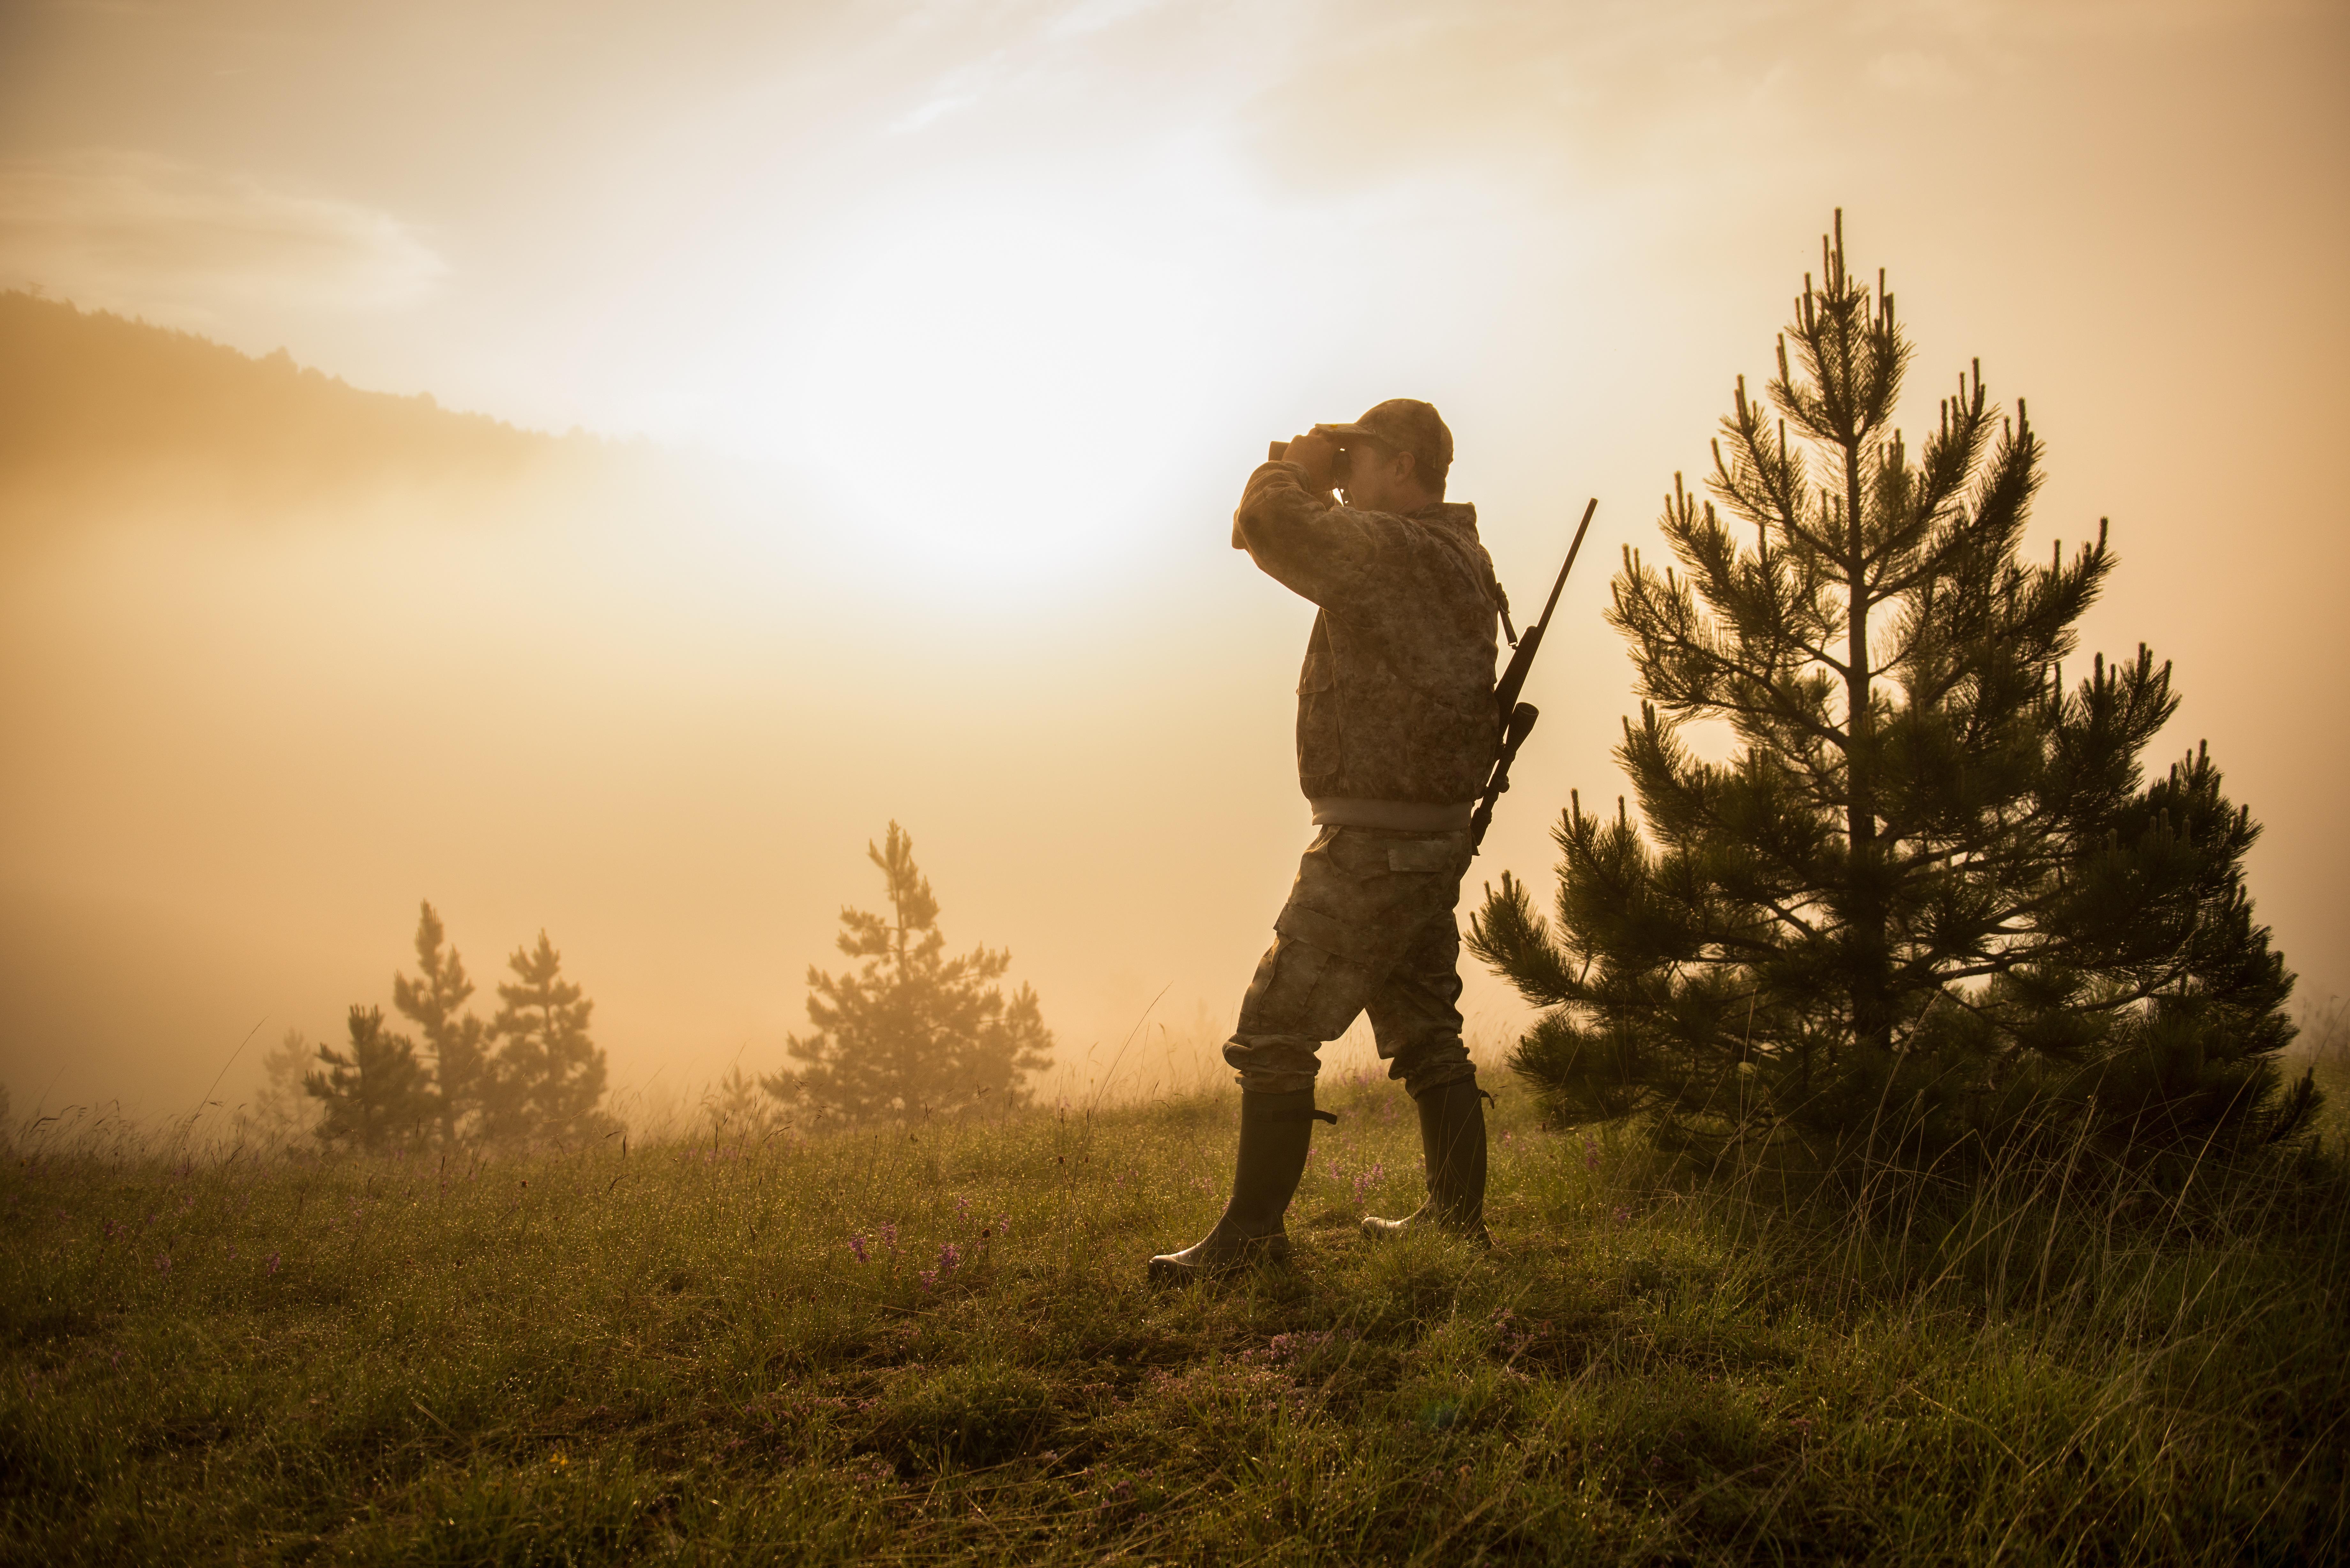 U.S. Fish & Wildlife Service Announces Expansion of Hunting & Fishing on National Wildlife Refuges